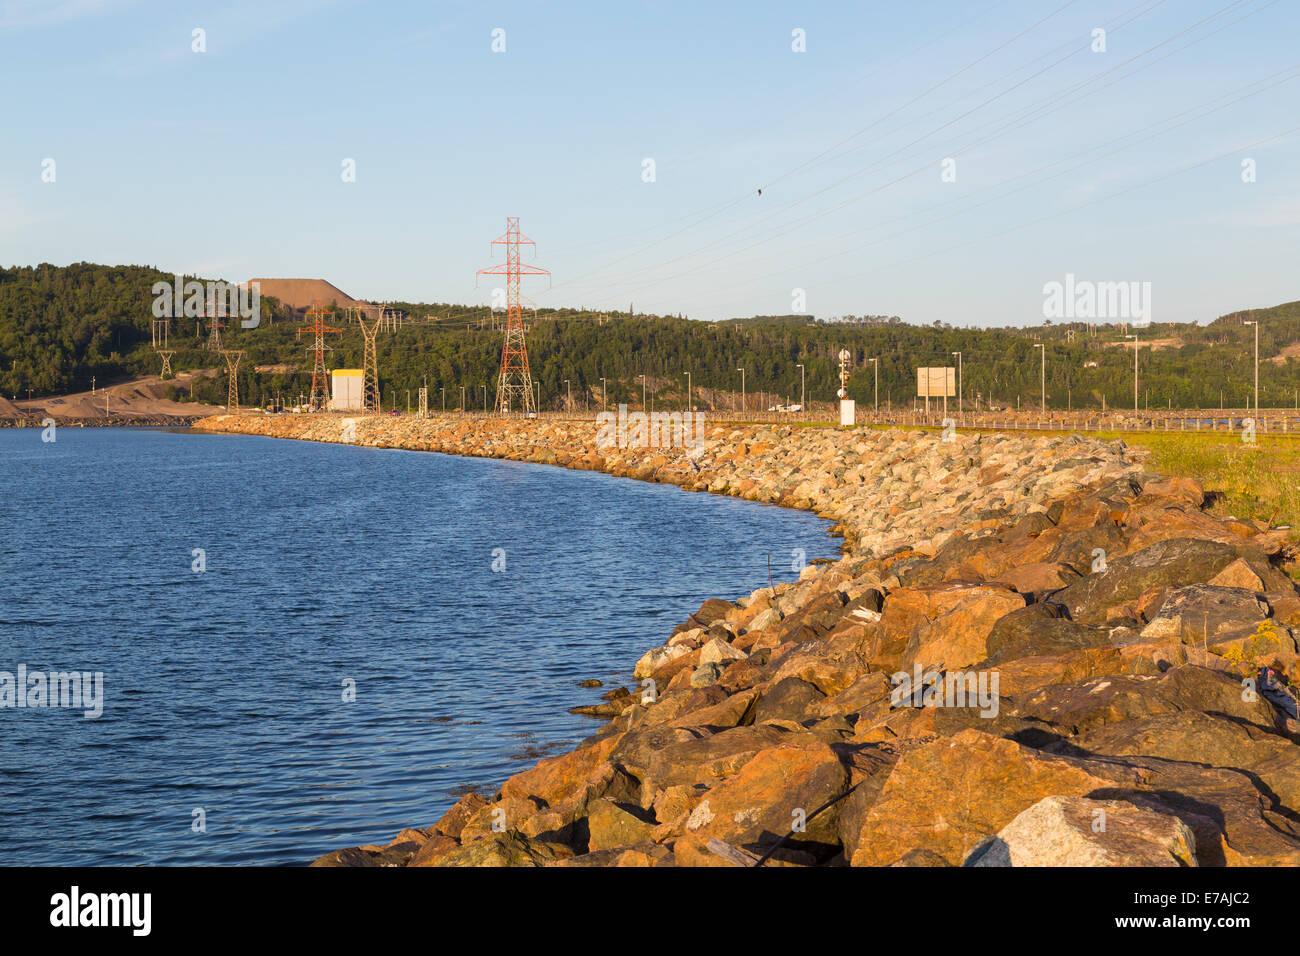 Part of the Canso Causeway linking Cape Breton to the Nova Scotia peninsula Stock Photo